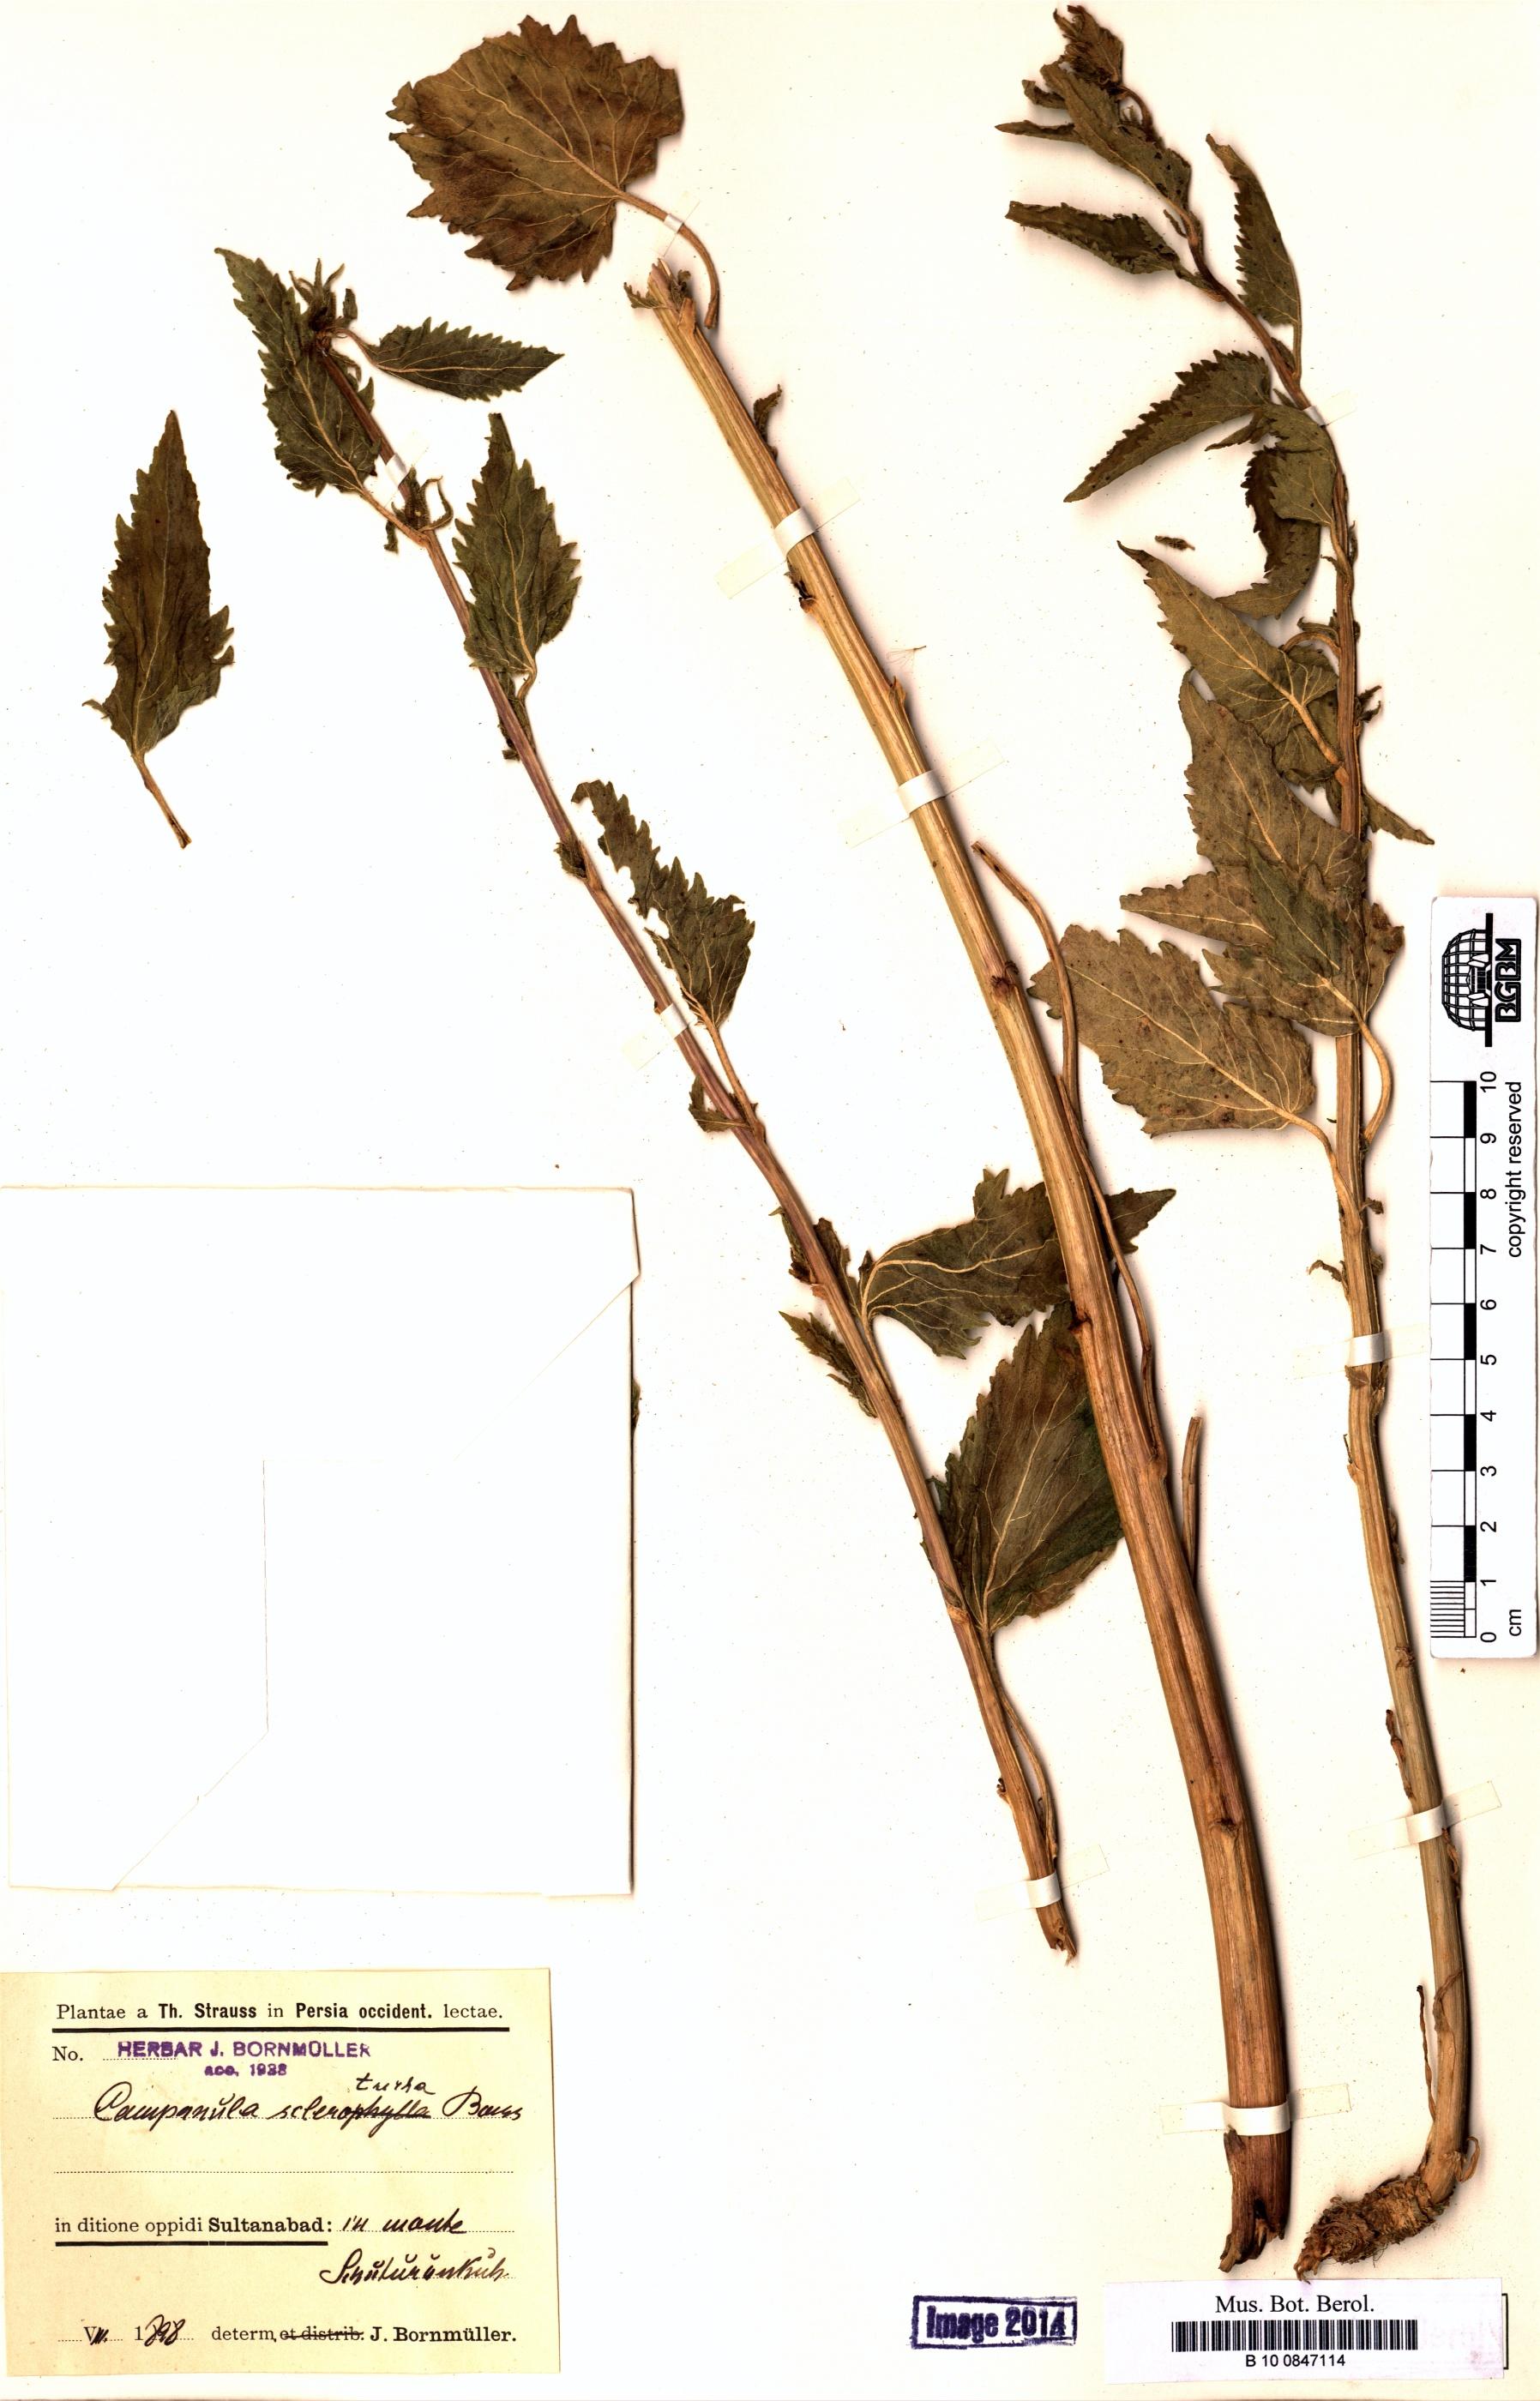 http://ww2.bgbm.org/herbarium/images/B/10/08/47/11/B_10_0847114.jpg